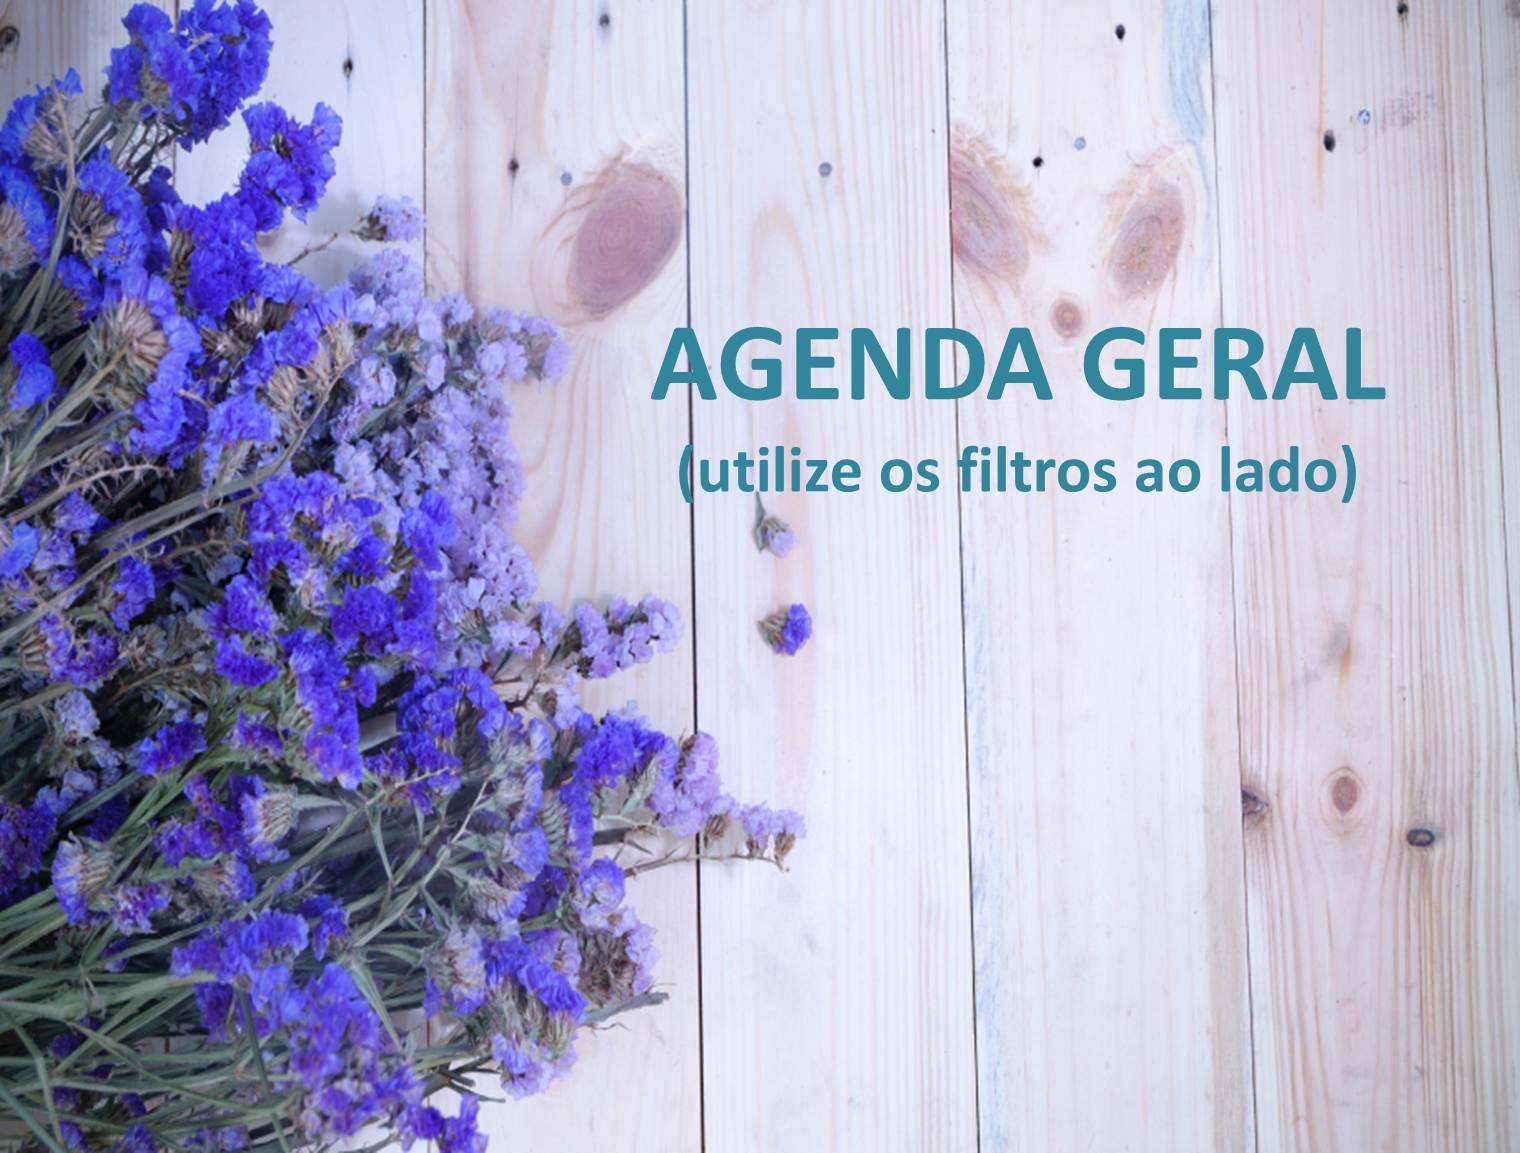 AGENDA GERAL (NEW)